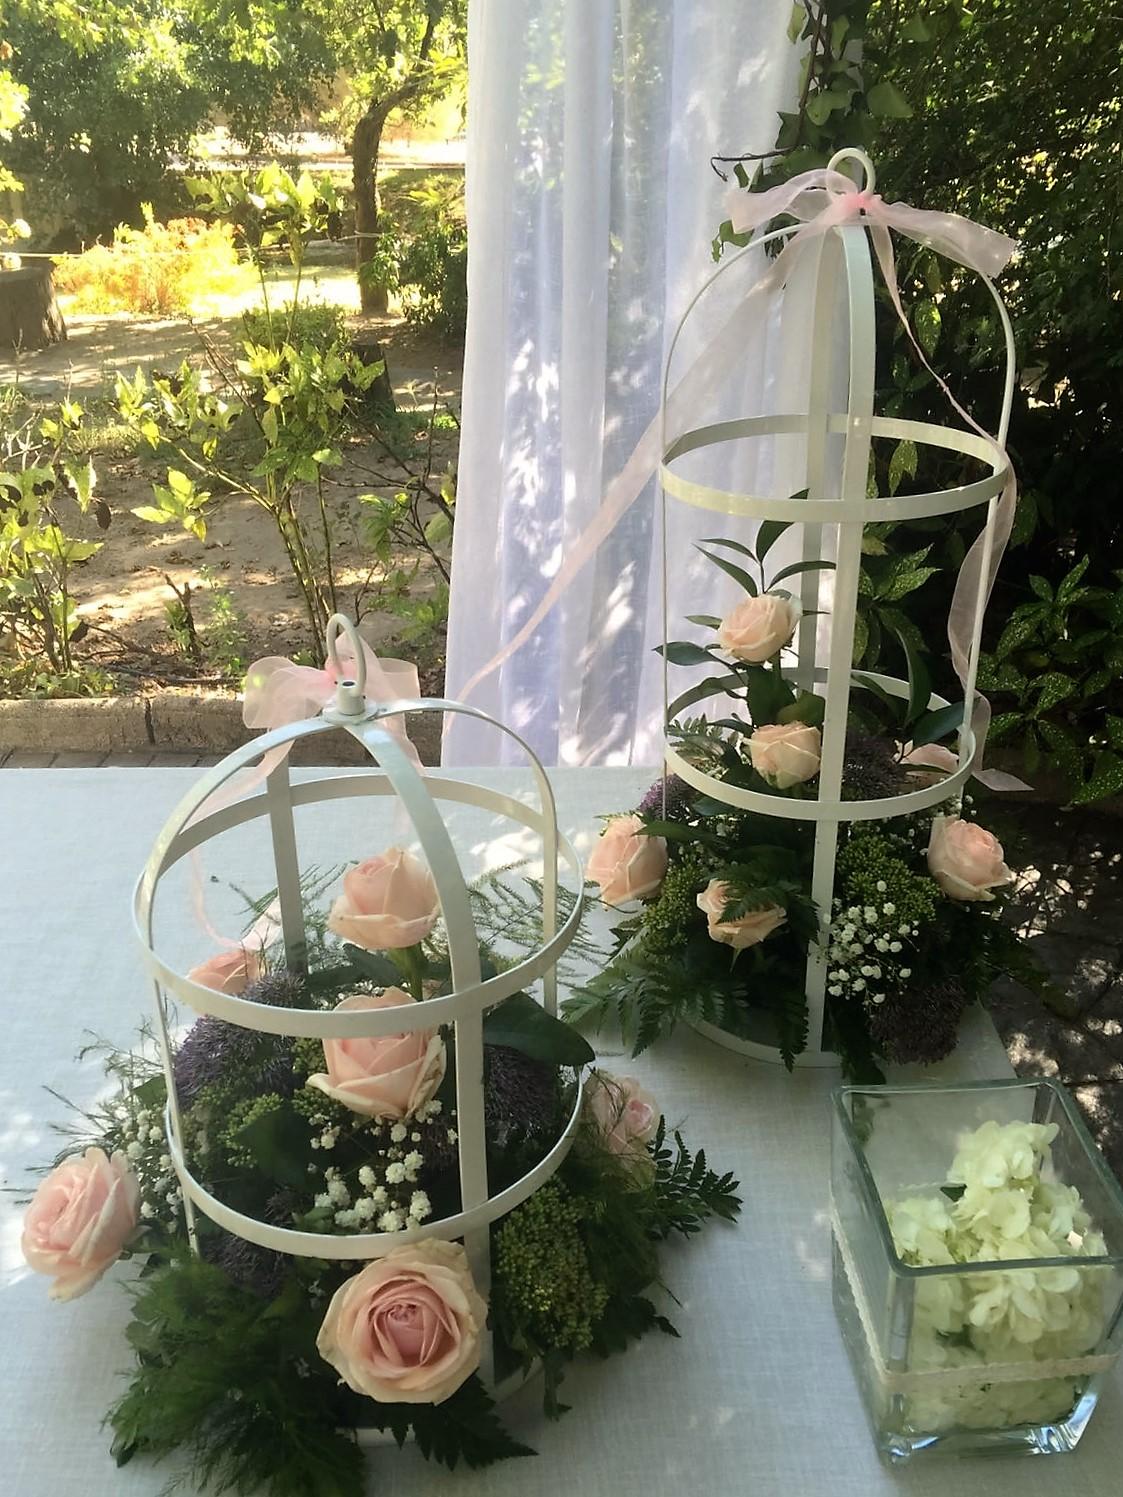 floristeria-eventos-valle-del-jerte-la-casita-de-las-flores-bodas-diseno-flo